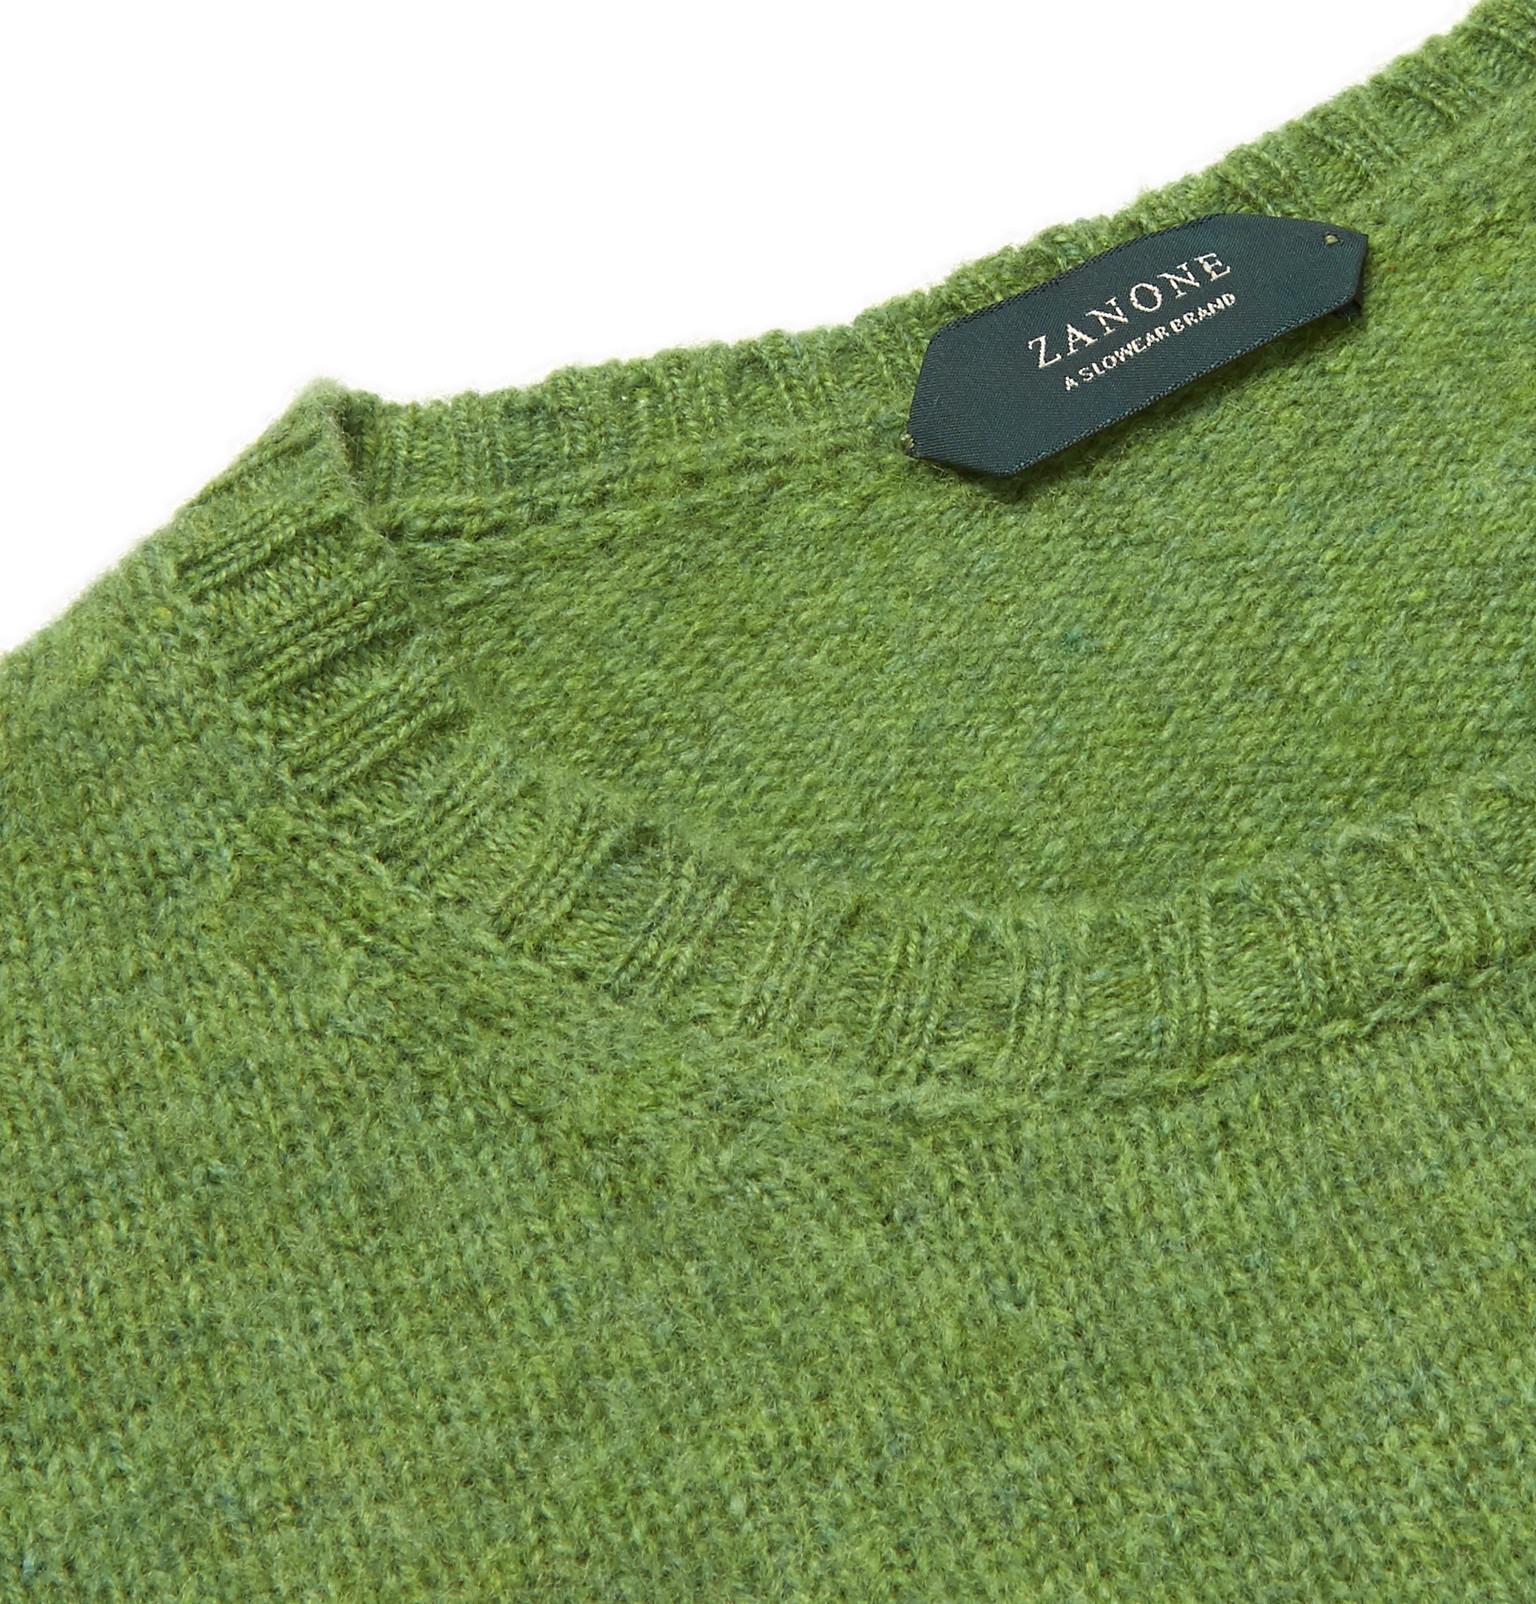 Sweater Sweater Incotexbrushed Virgin Wool Incotexbrushed Wool Virgin Virgin Incotexbrushed Sweater Wool p7qxawv